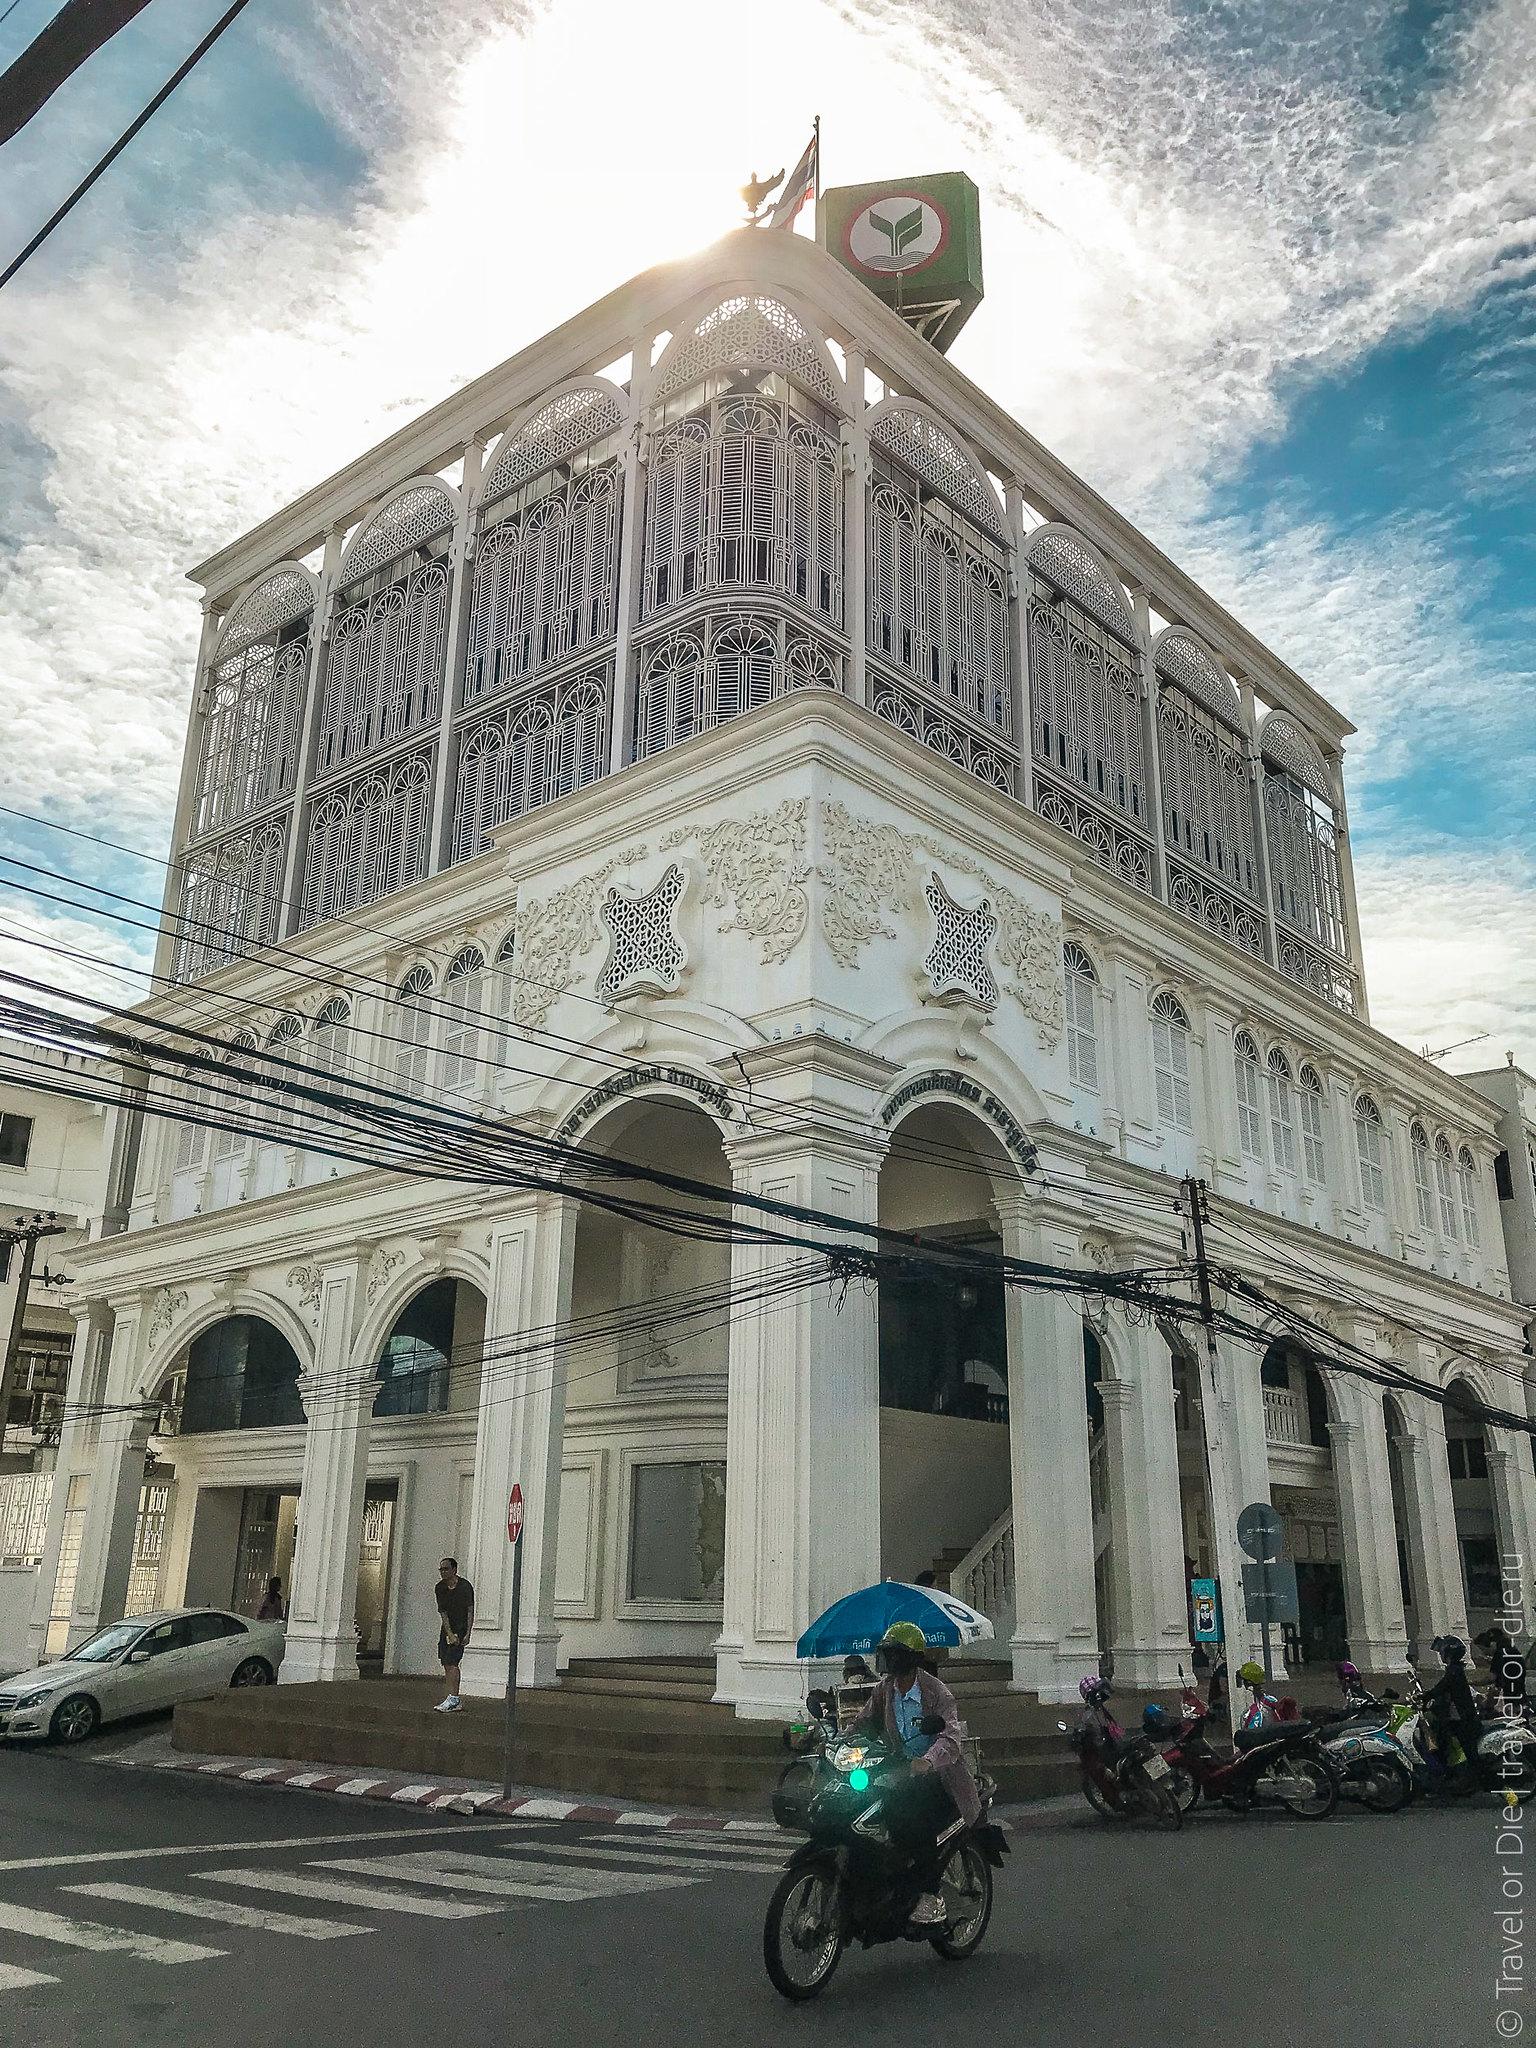 Phuket-Town-Old-Town-Thailand-3916